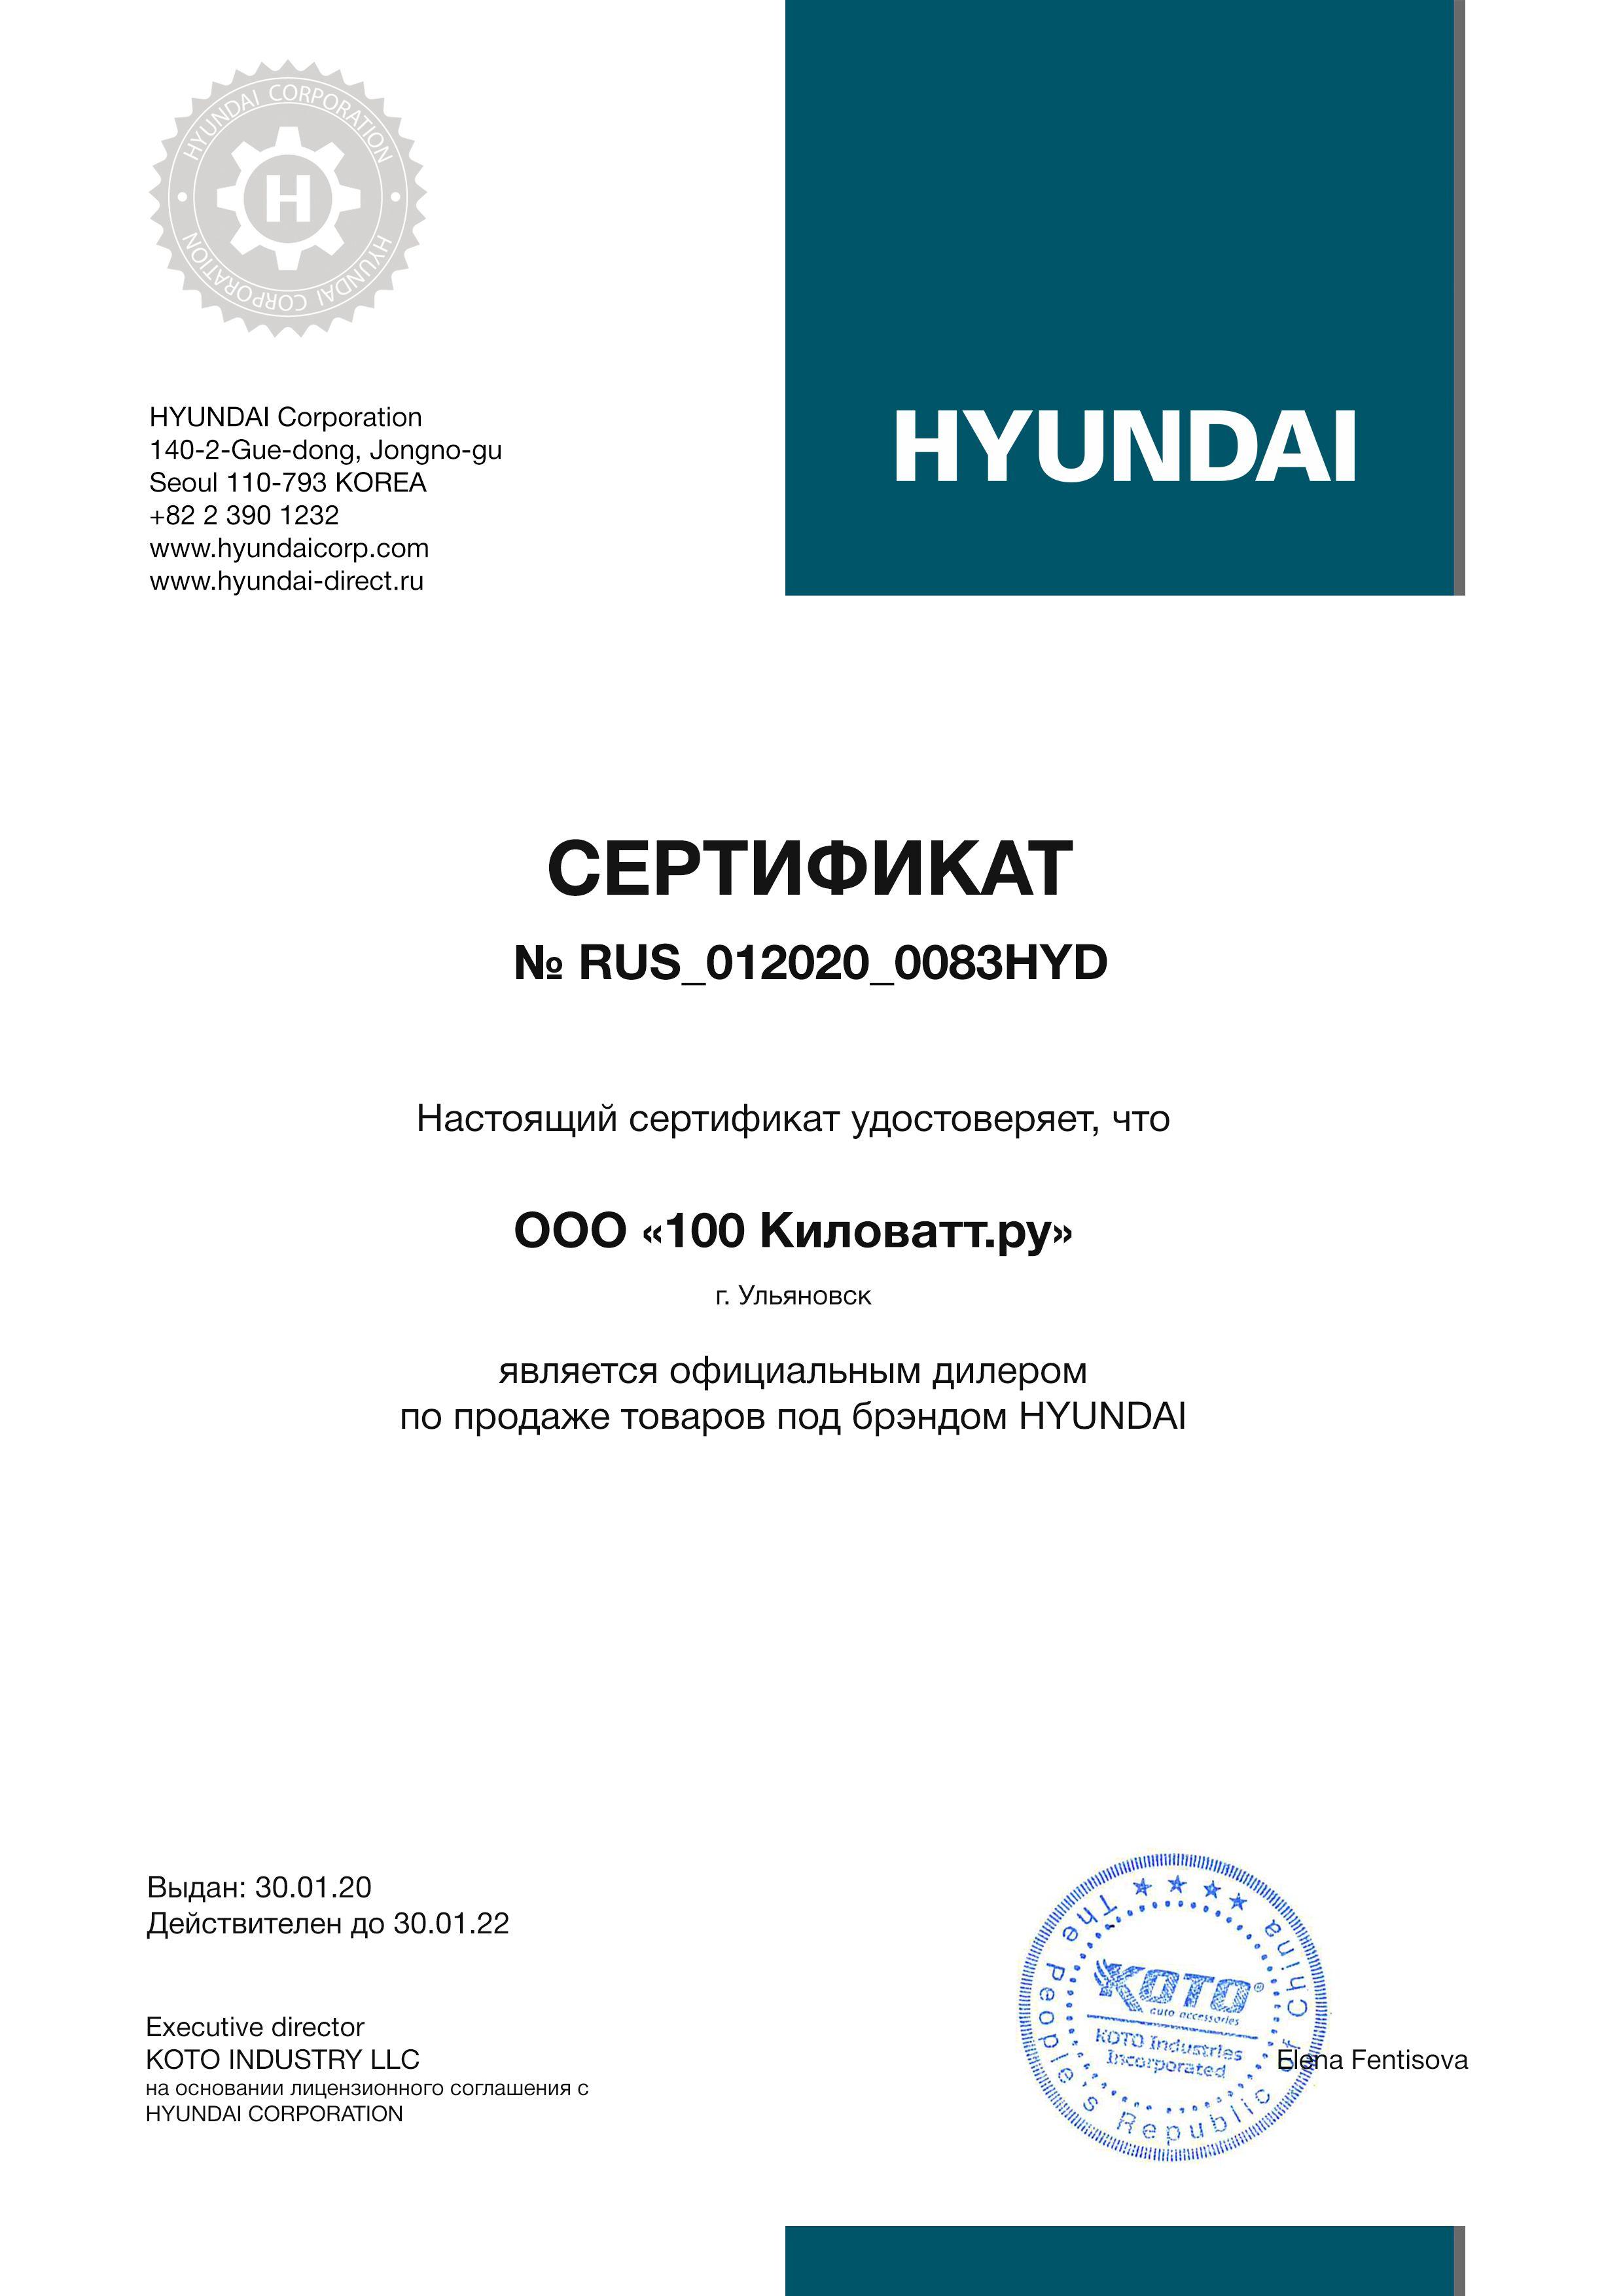 Hyundai - Сертификат дилера